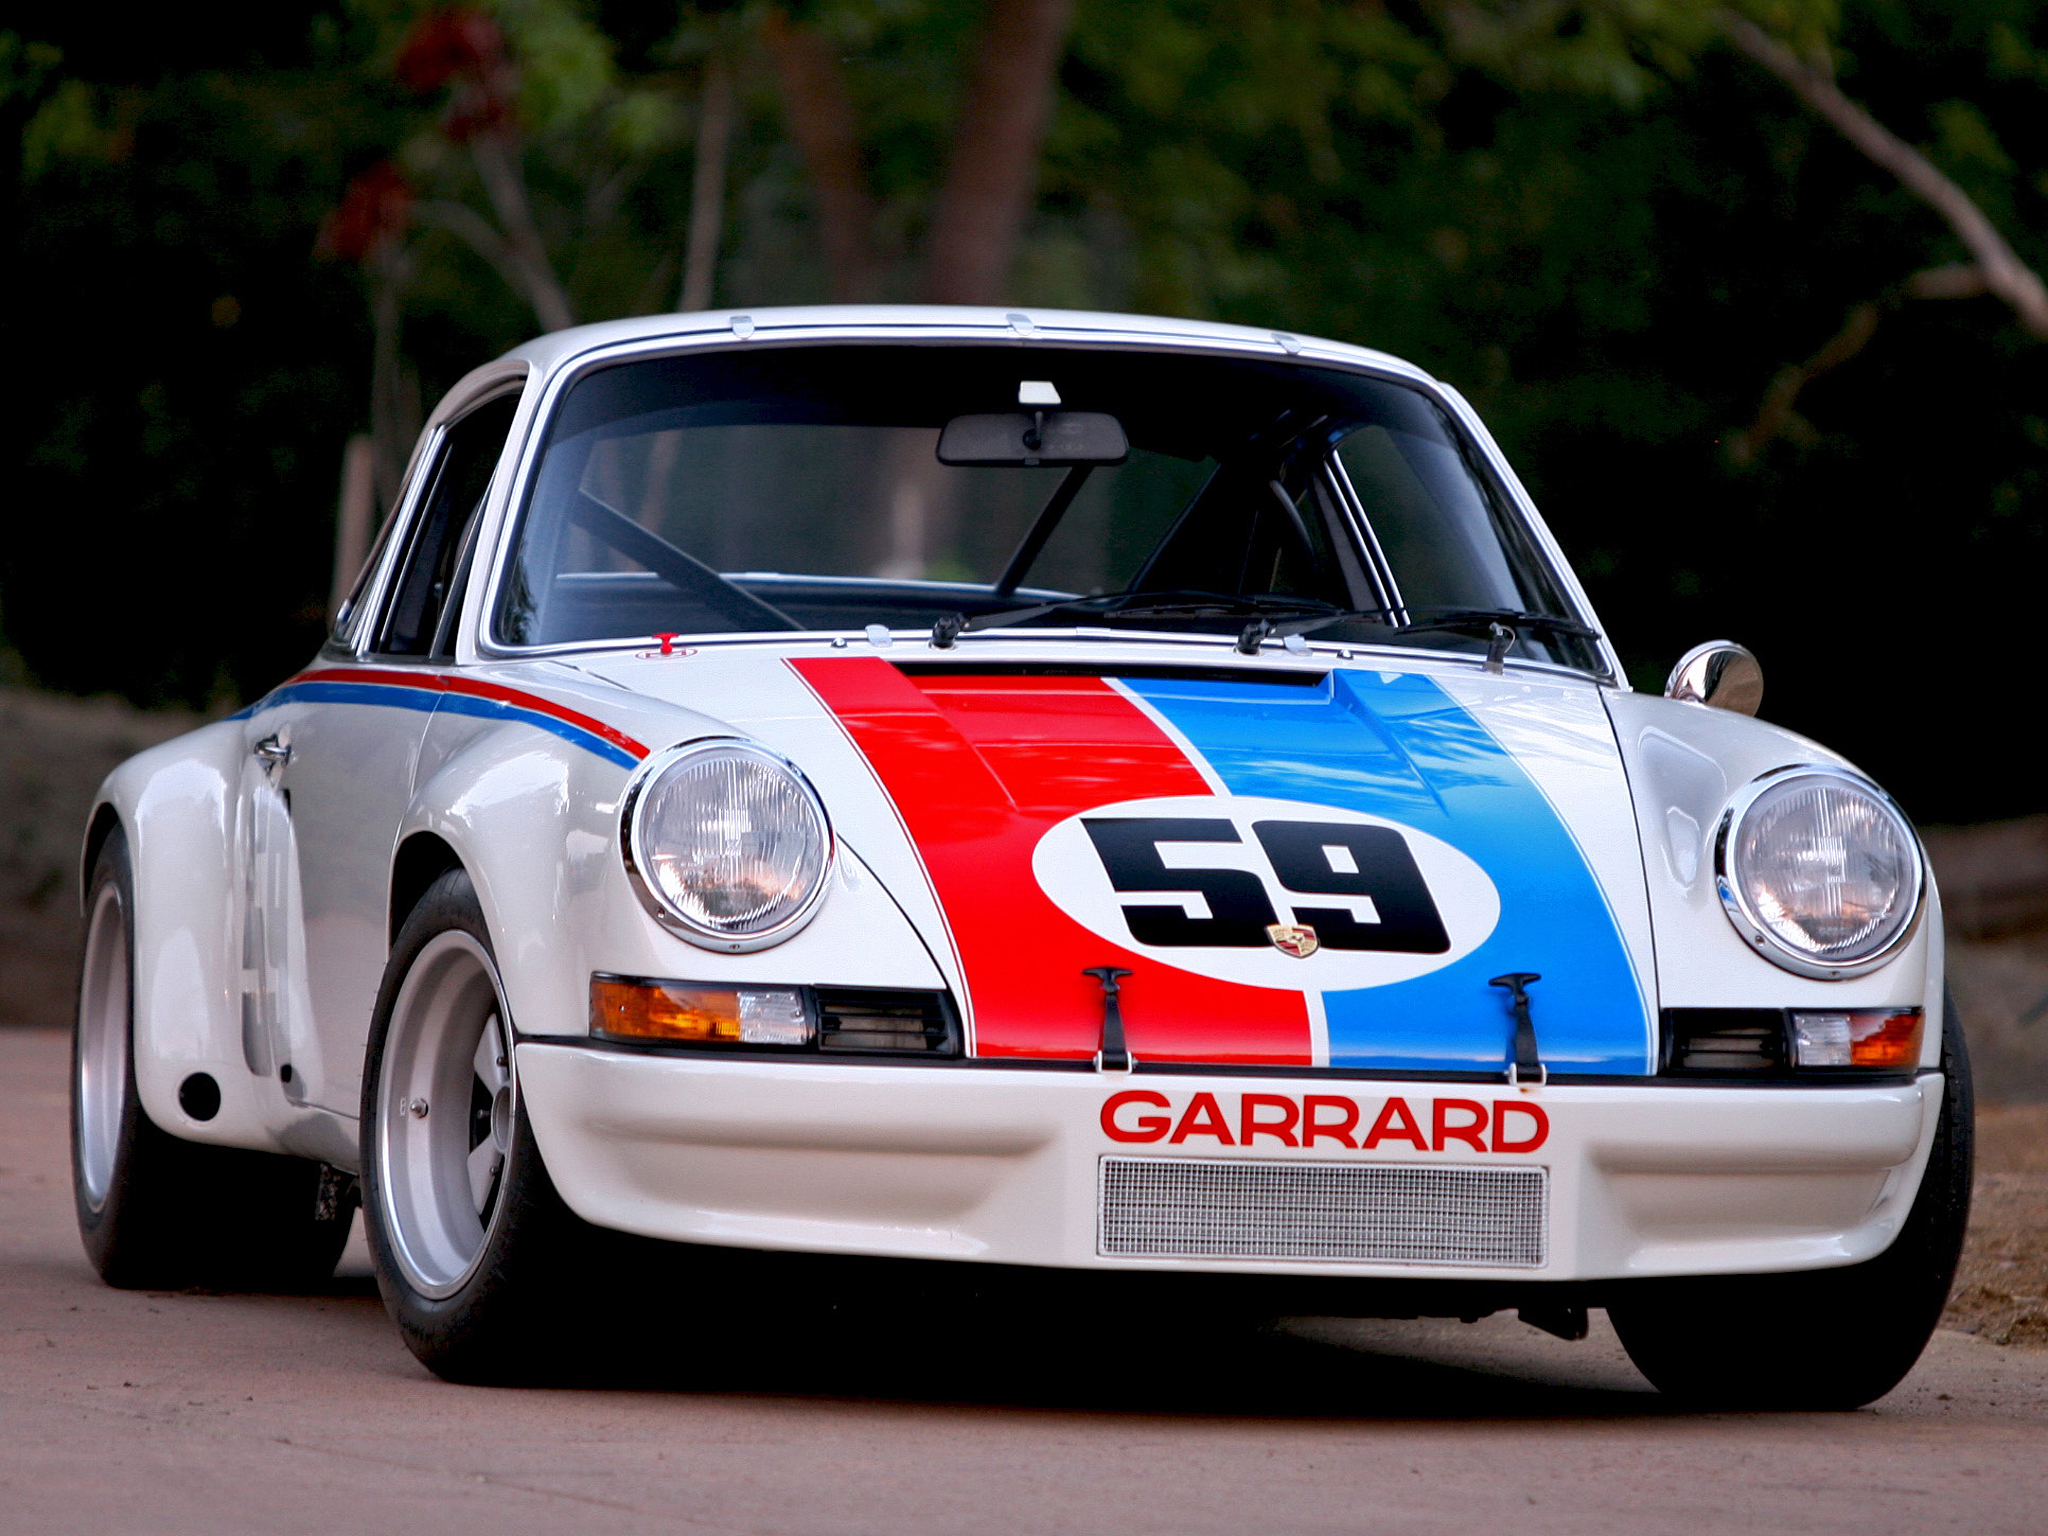 Car Wallpaper >> 1972 Porsche 911 Carrera RSR Coupe supercar supercars race racing classic g wallpaper ...